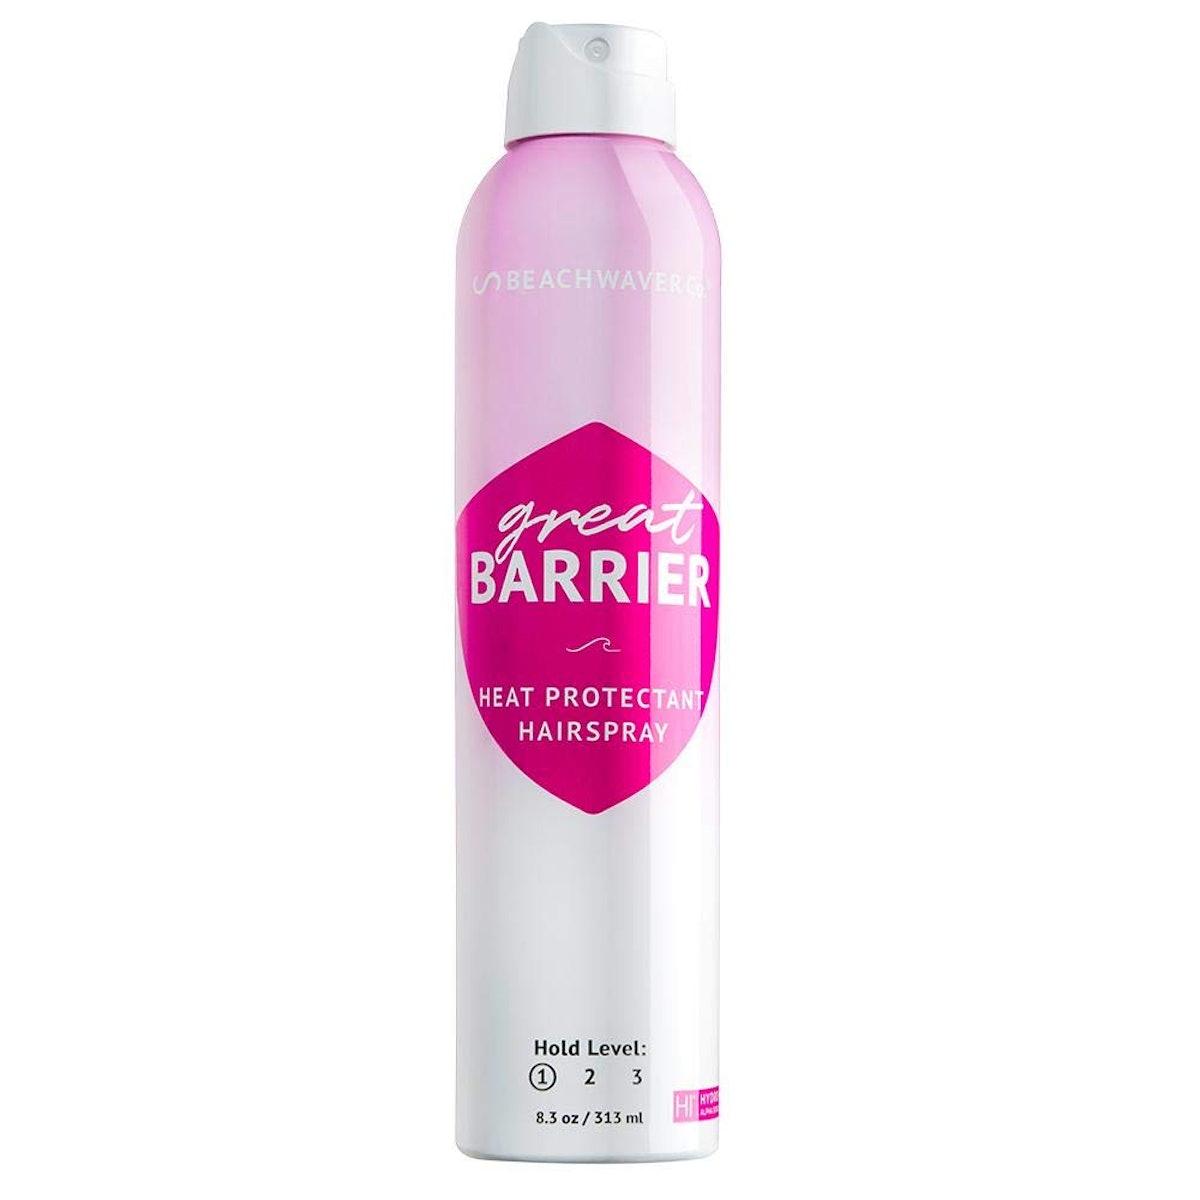 The Beachwaver Co. Great Barrier Heat Protectant Hairspray